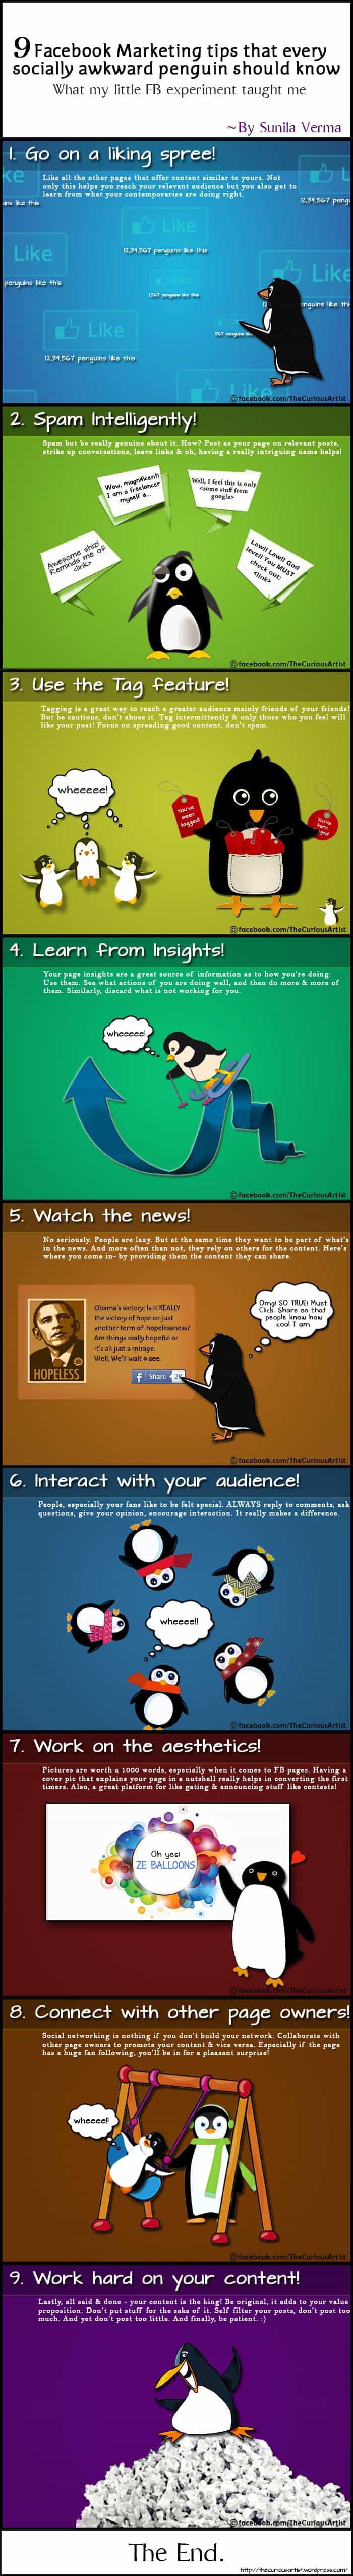 9 FB Marketing Tips